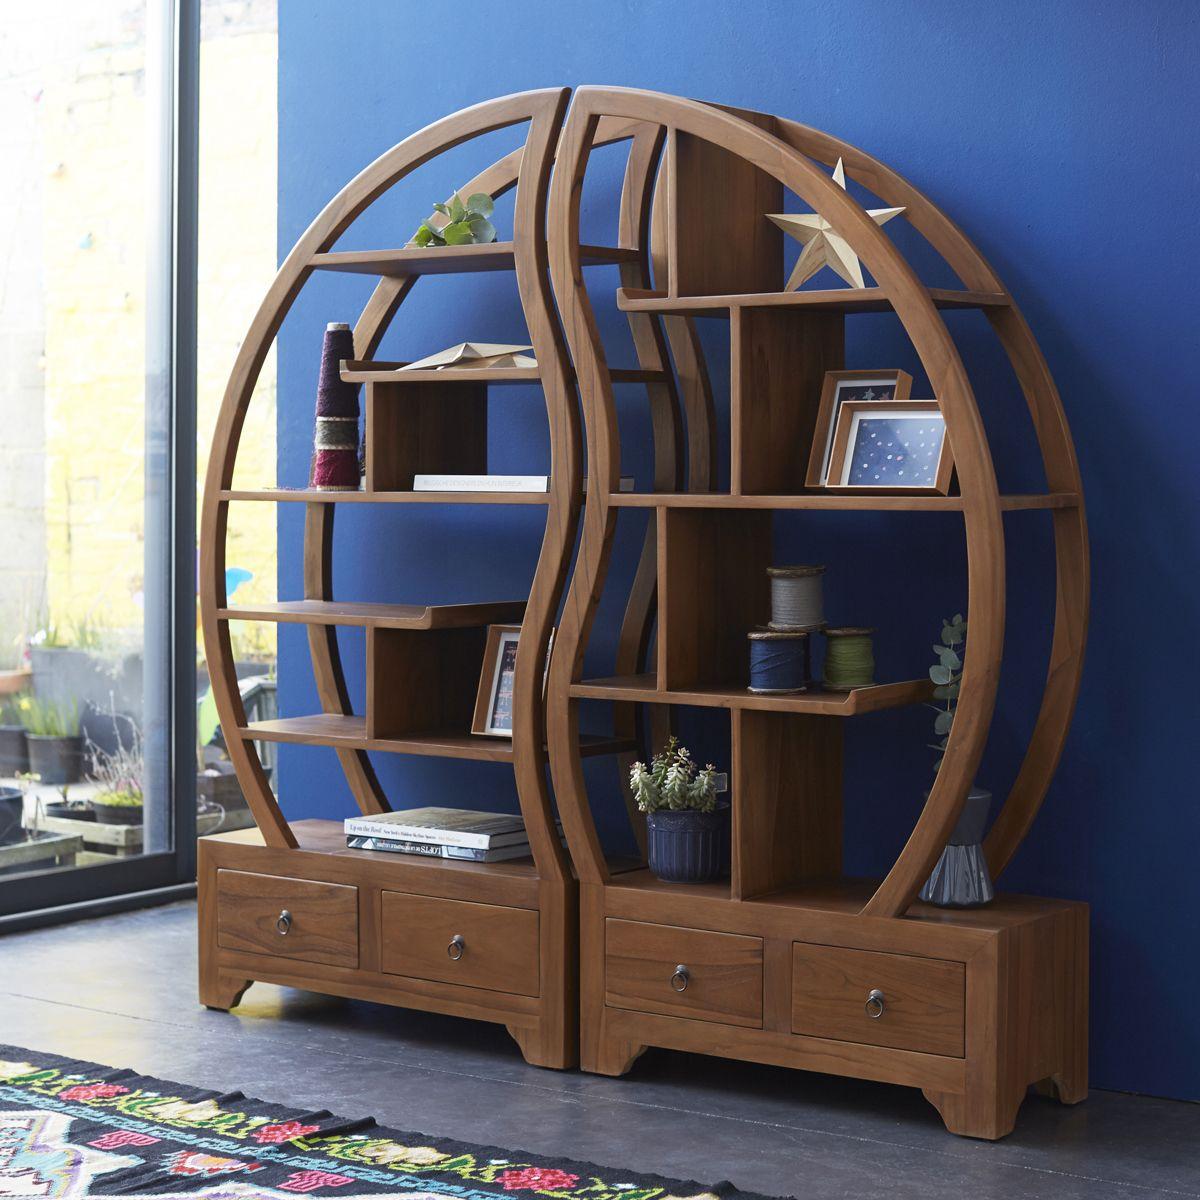 Sphere Bi Ying Yang Teak Bookshelf 155x155 In 2020 Art Deco